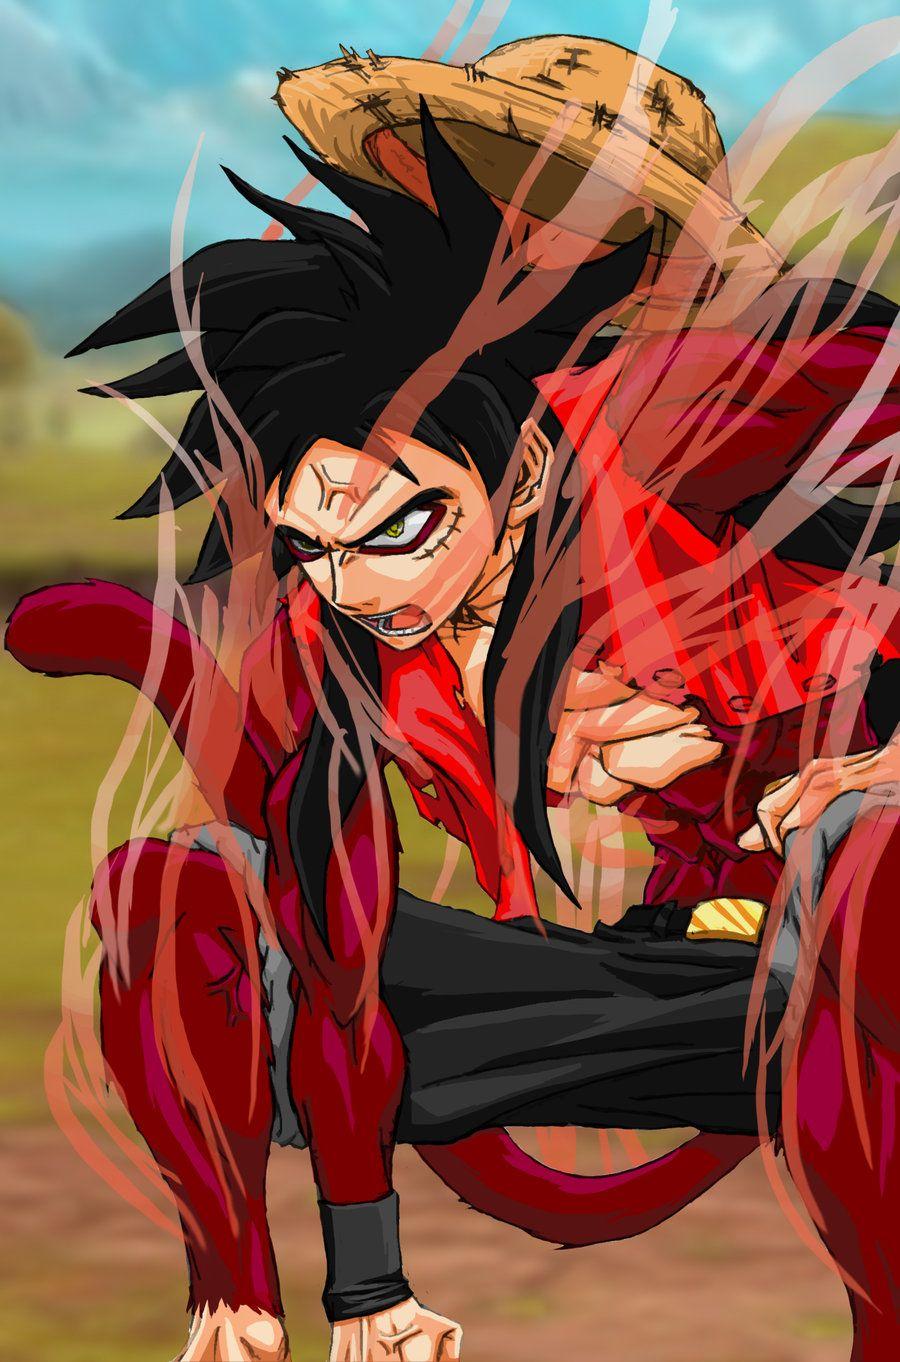 Goku Luffy Fusion One Piece and Dragon Ball. Easily one